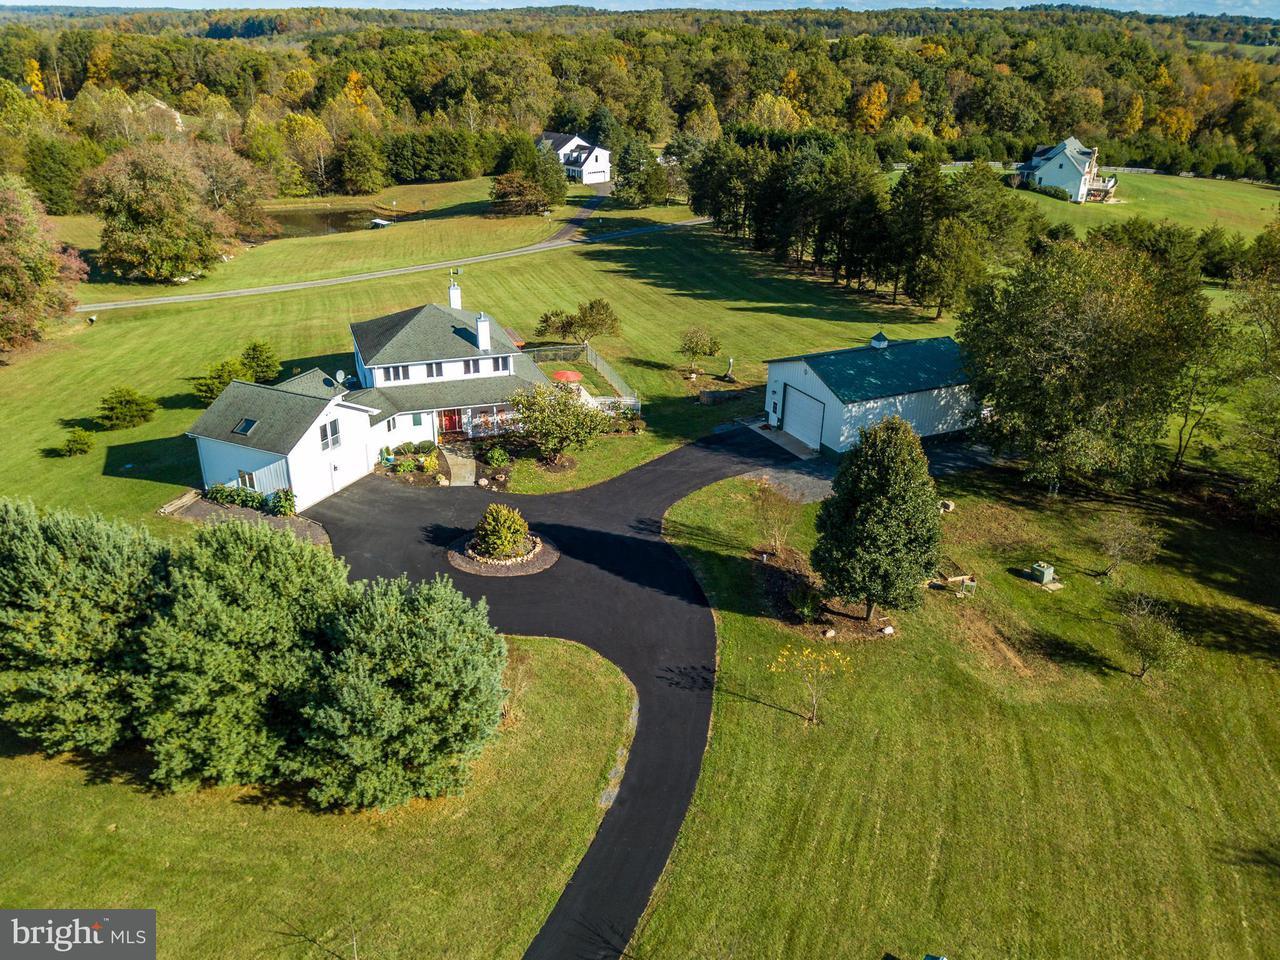 Single Family Home for Sale at 14446 GLEN VERDANT Drive 14446 GLEN VERDANT Drive Culpeper, Virginia 22701 United States